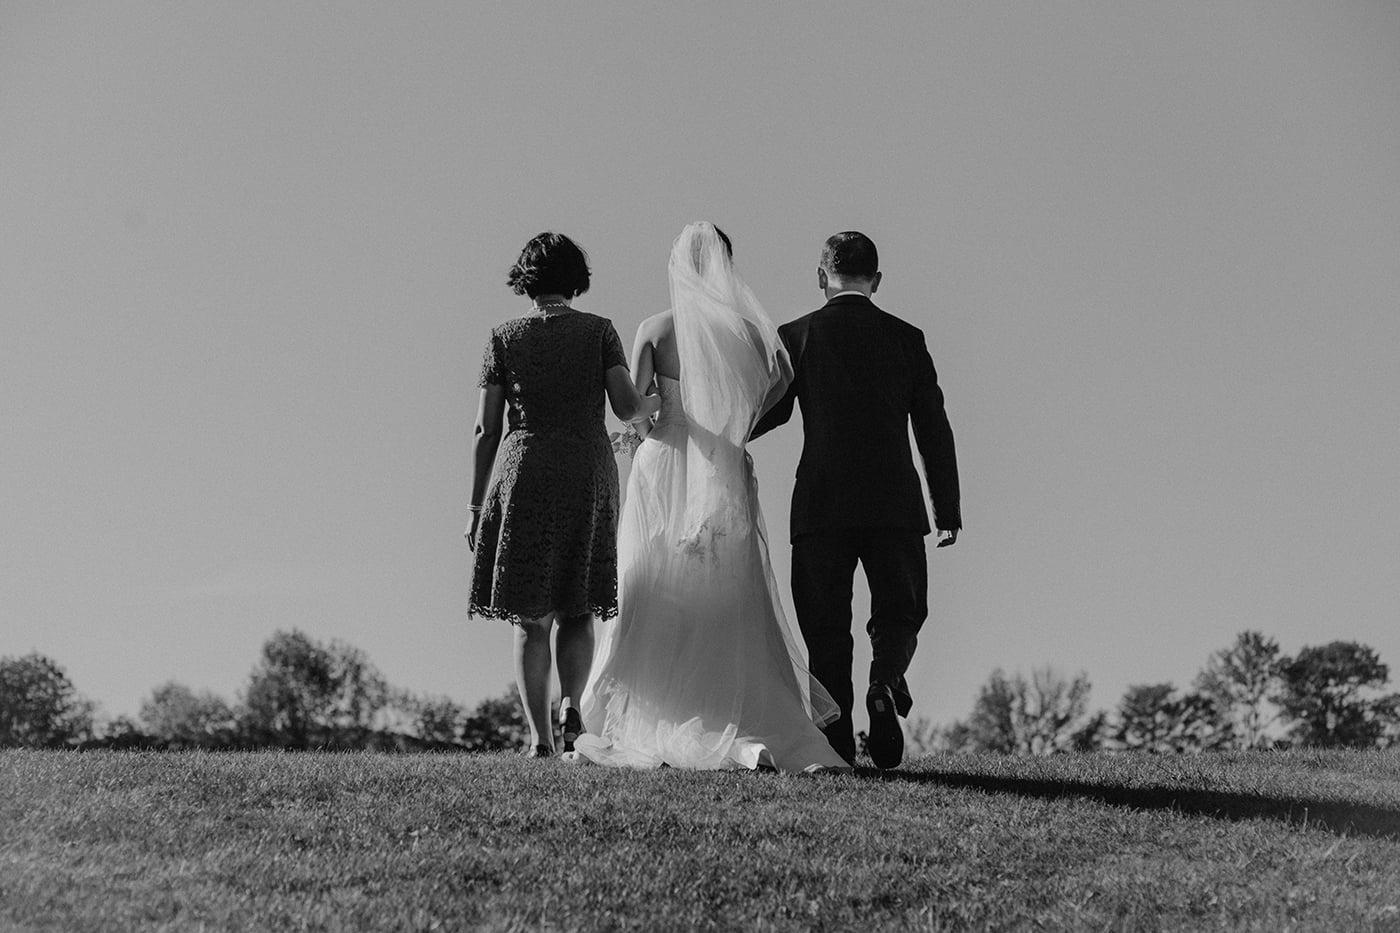 wedding-details-vermont-colorado-wedding-photographer-11.jpg